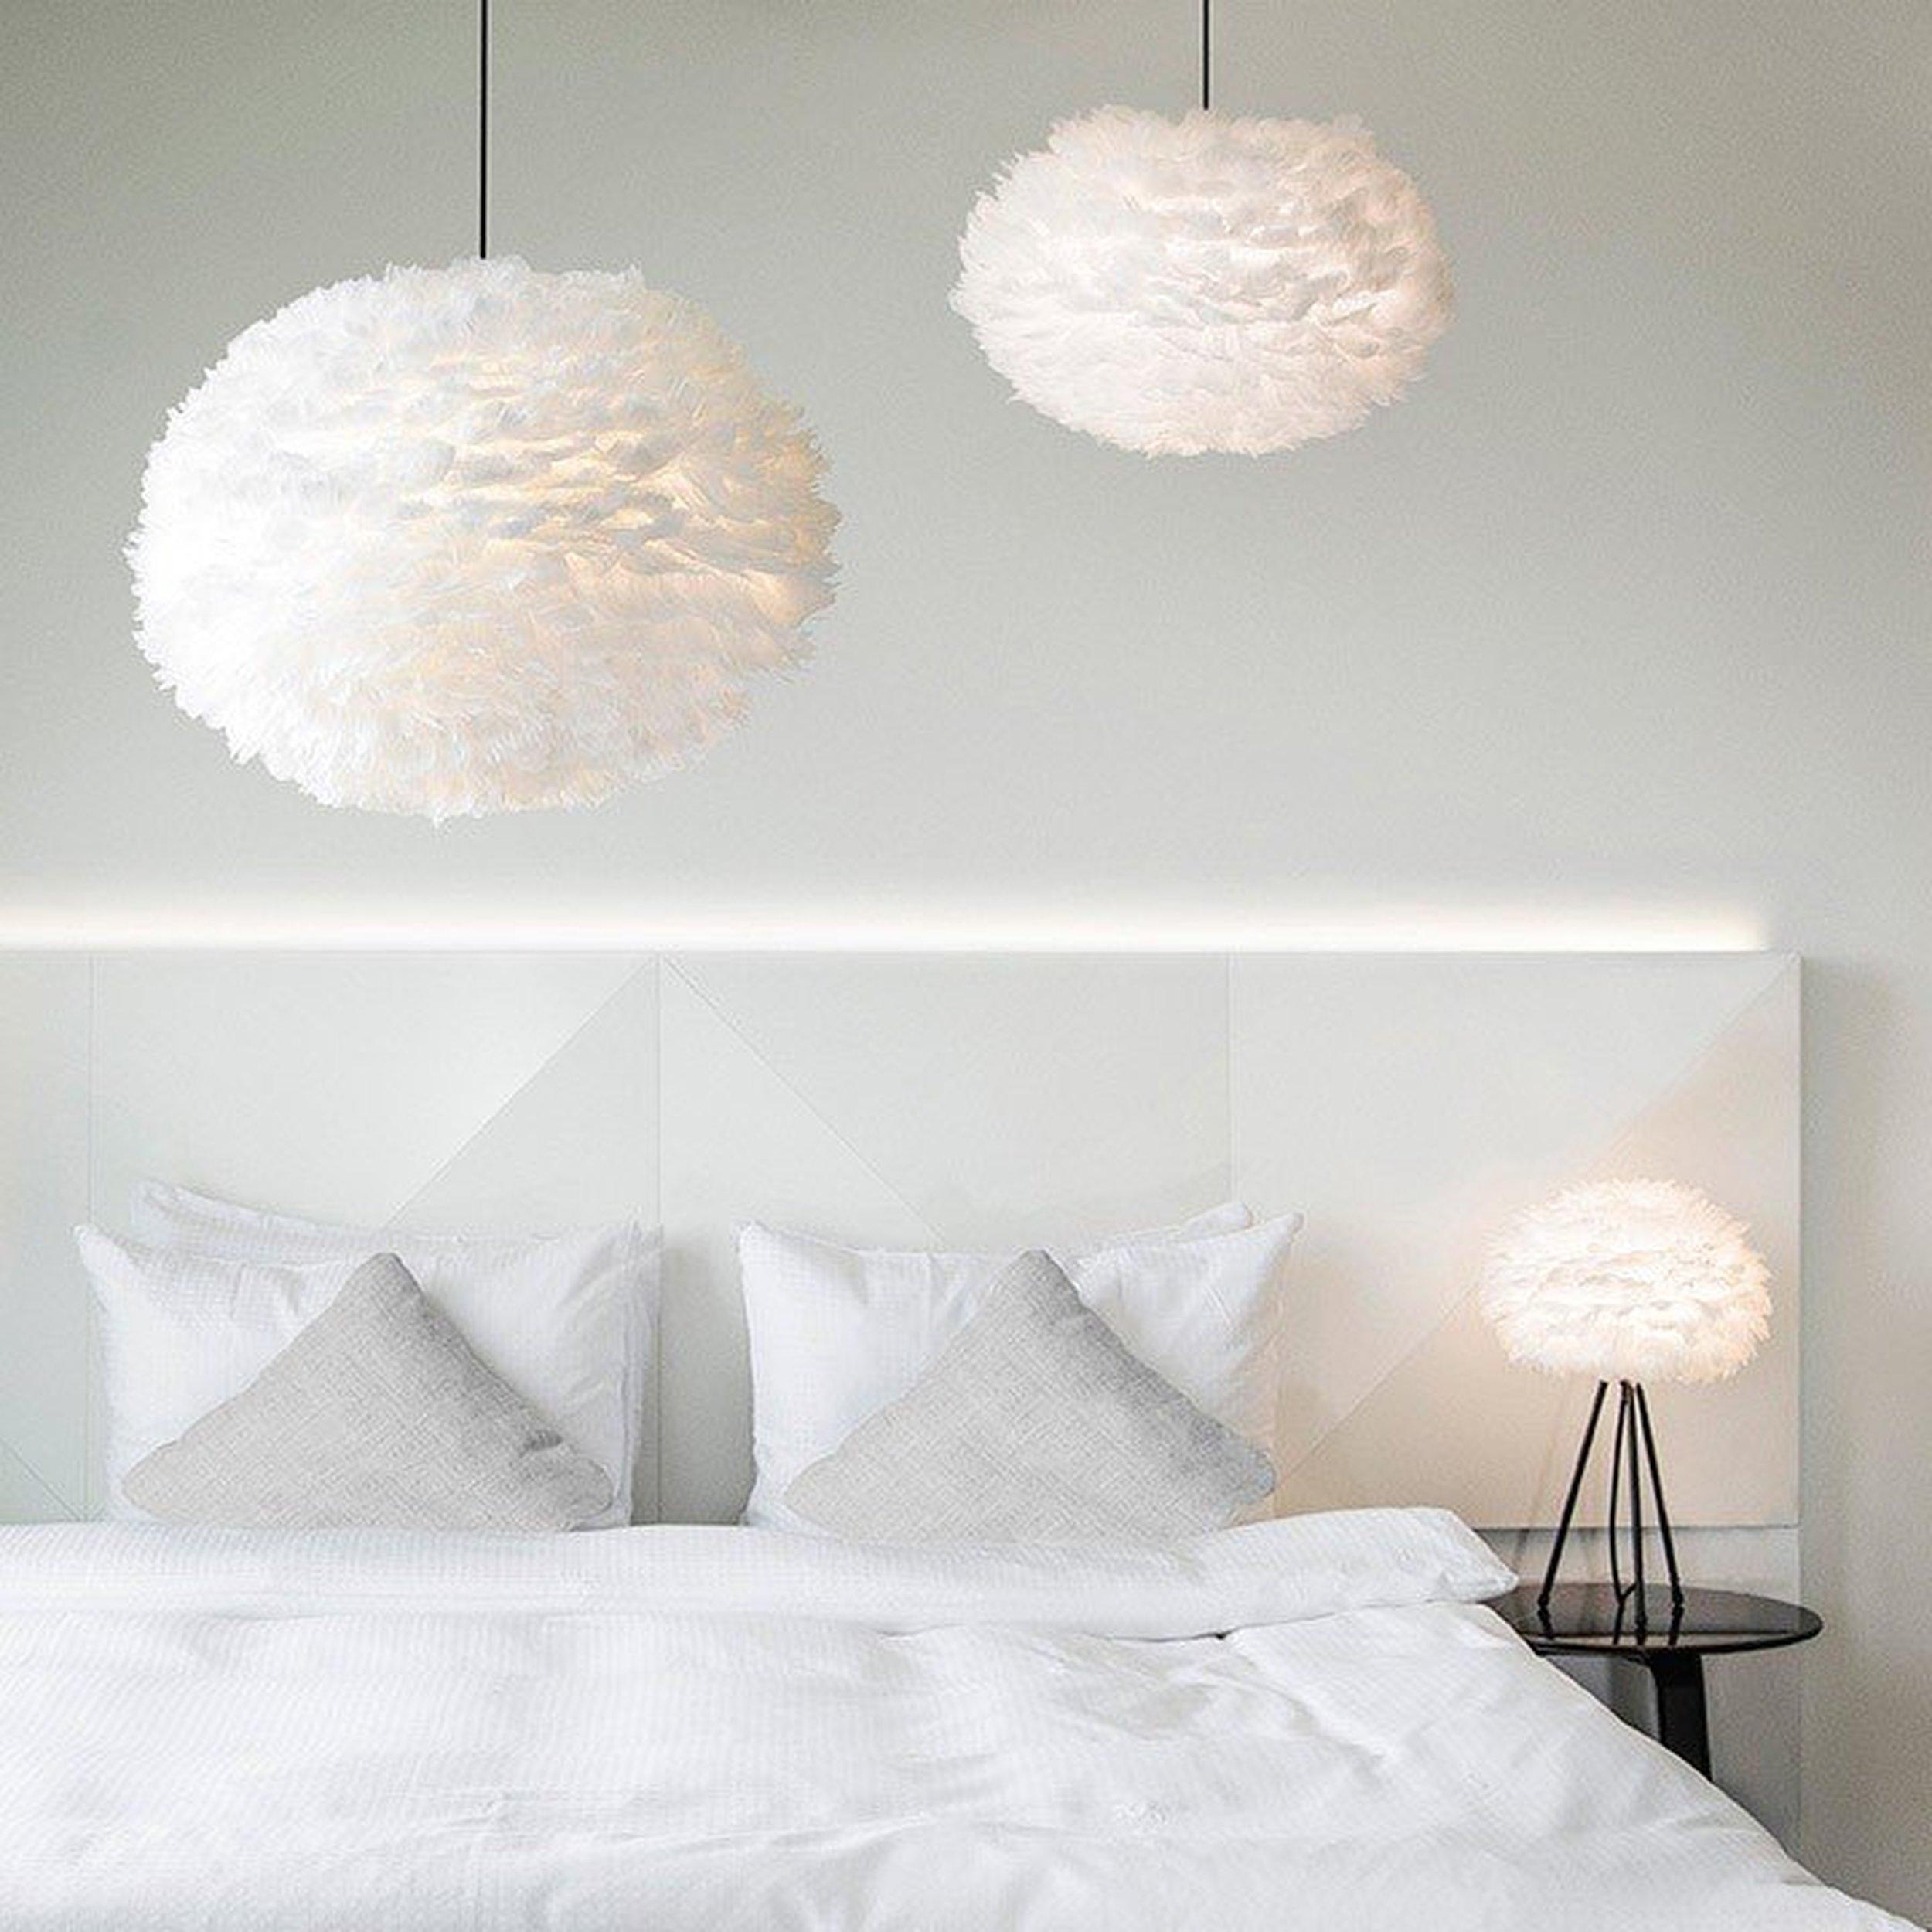 lampa eos bia a vita copenhagen fabryka form. Black Bedroom Furniture Sets. Home Design Ideas